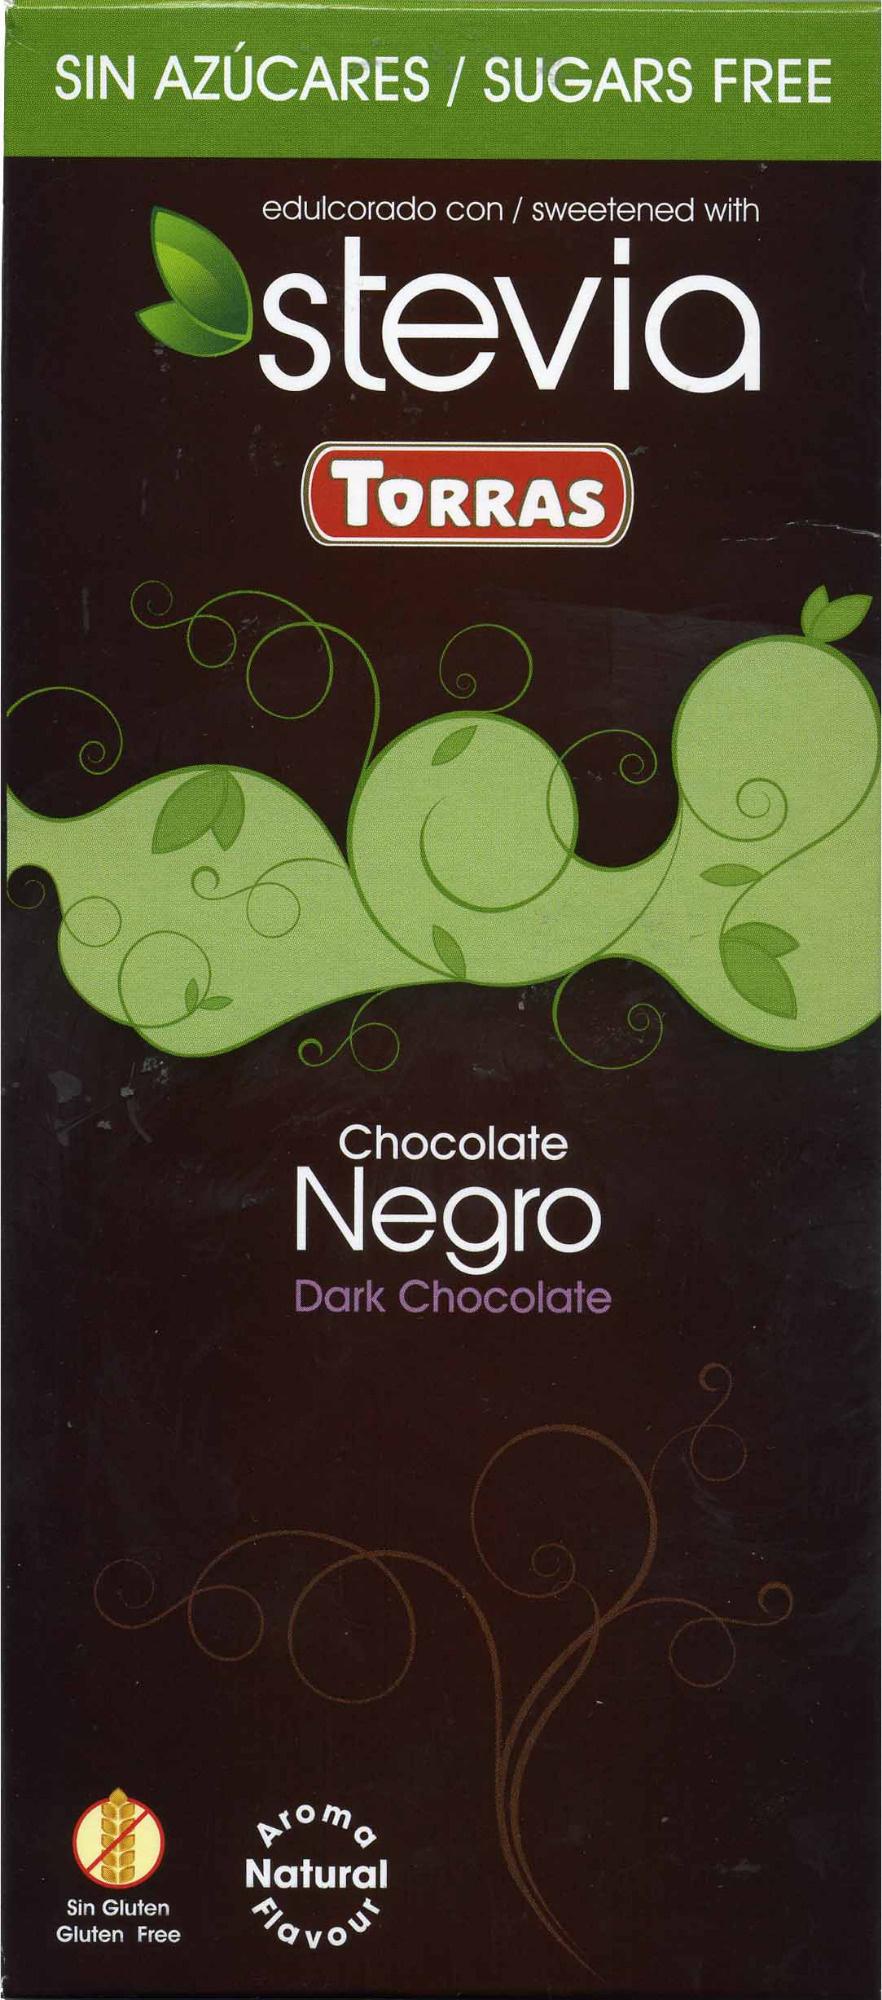 Tableta de chocolate negro edulcorado con estevia 60% cacao - Producto - es